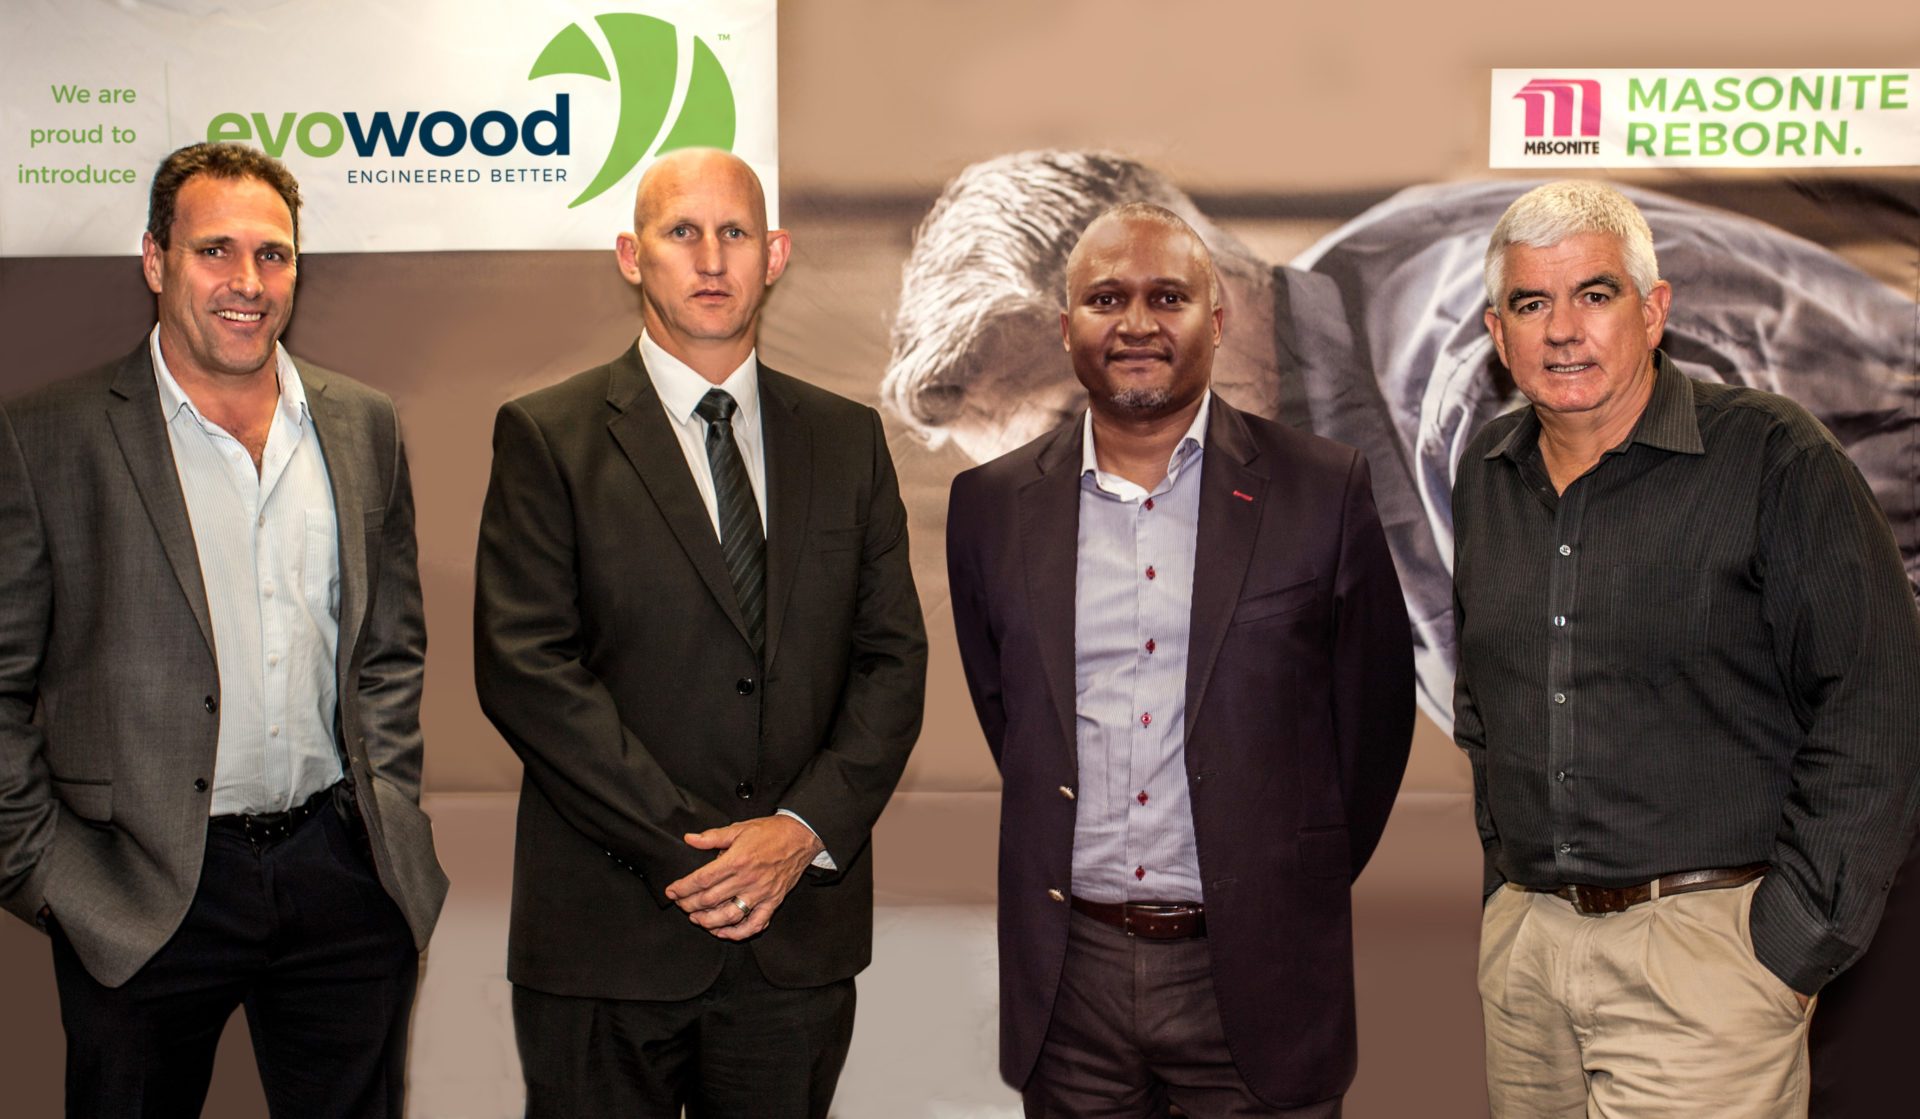 evowood-hilton-loring-quintin-terreblanche-nkosinathi-nhlangulela